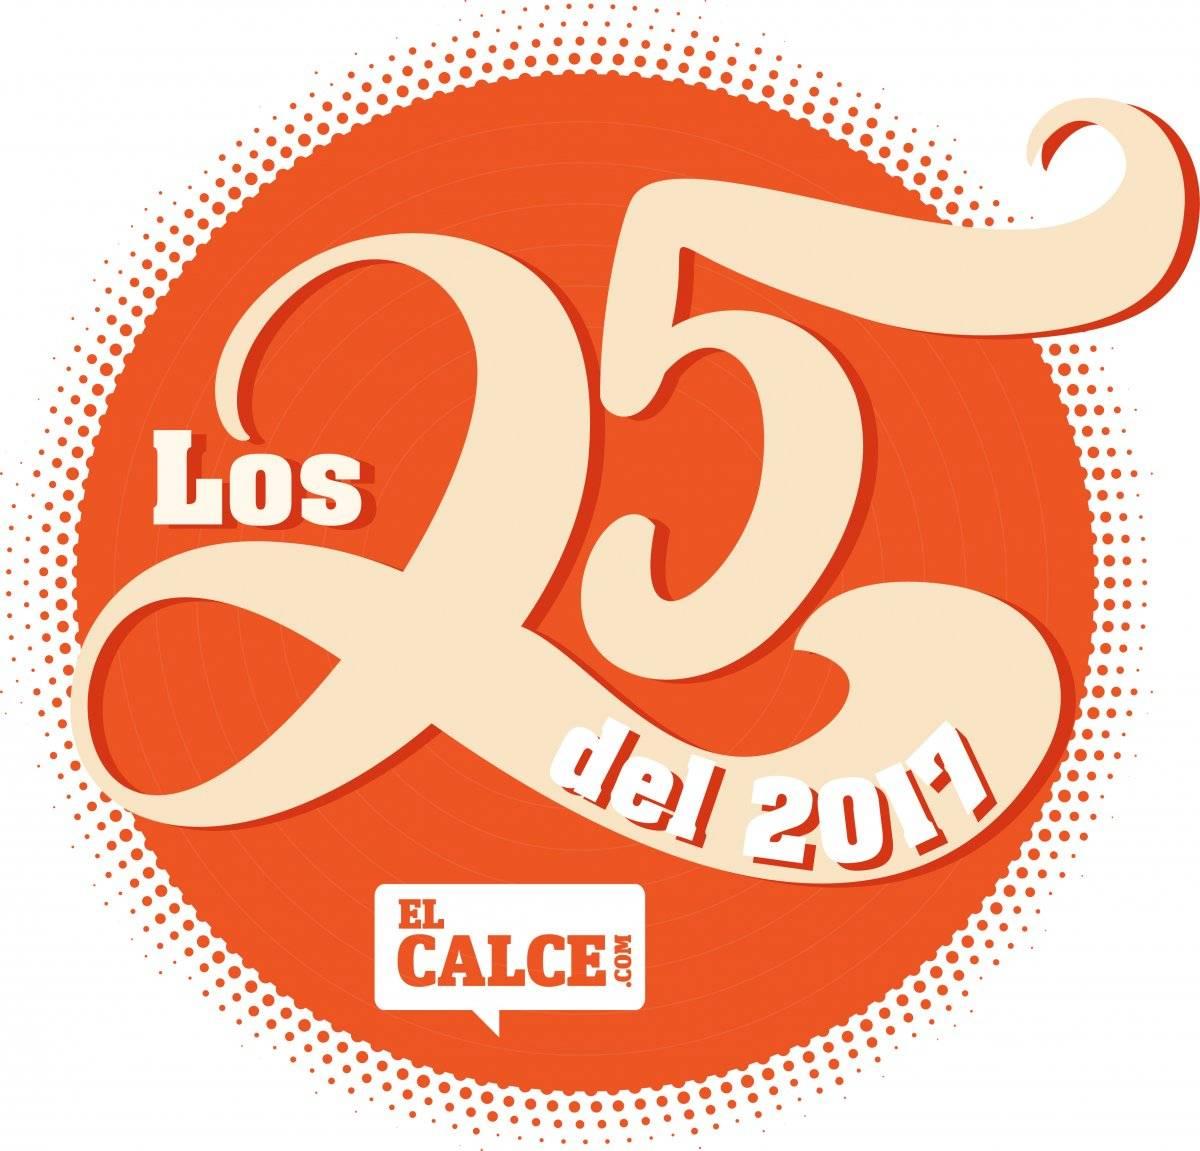 logolos25del2017-2f458291317a8696ba5f0b615ee458f7.jpg